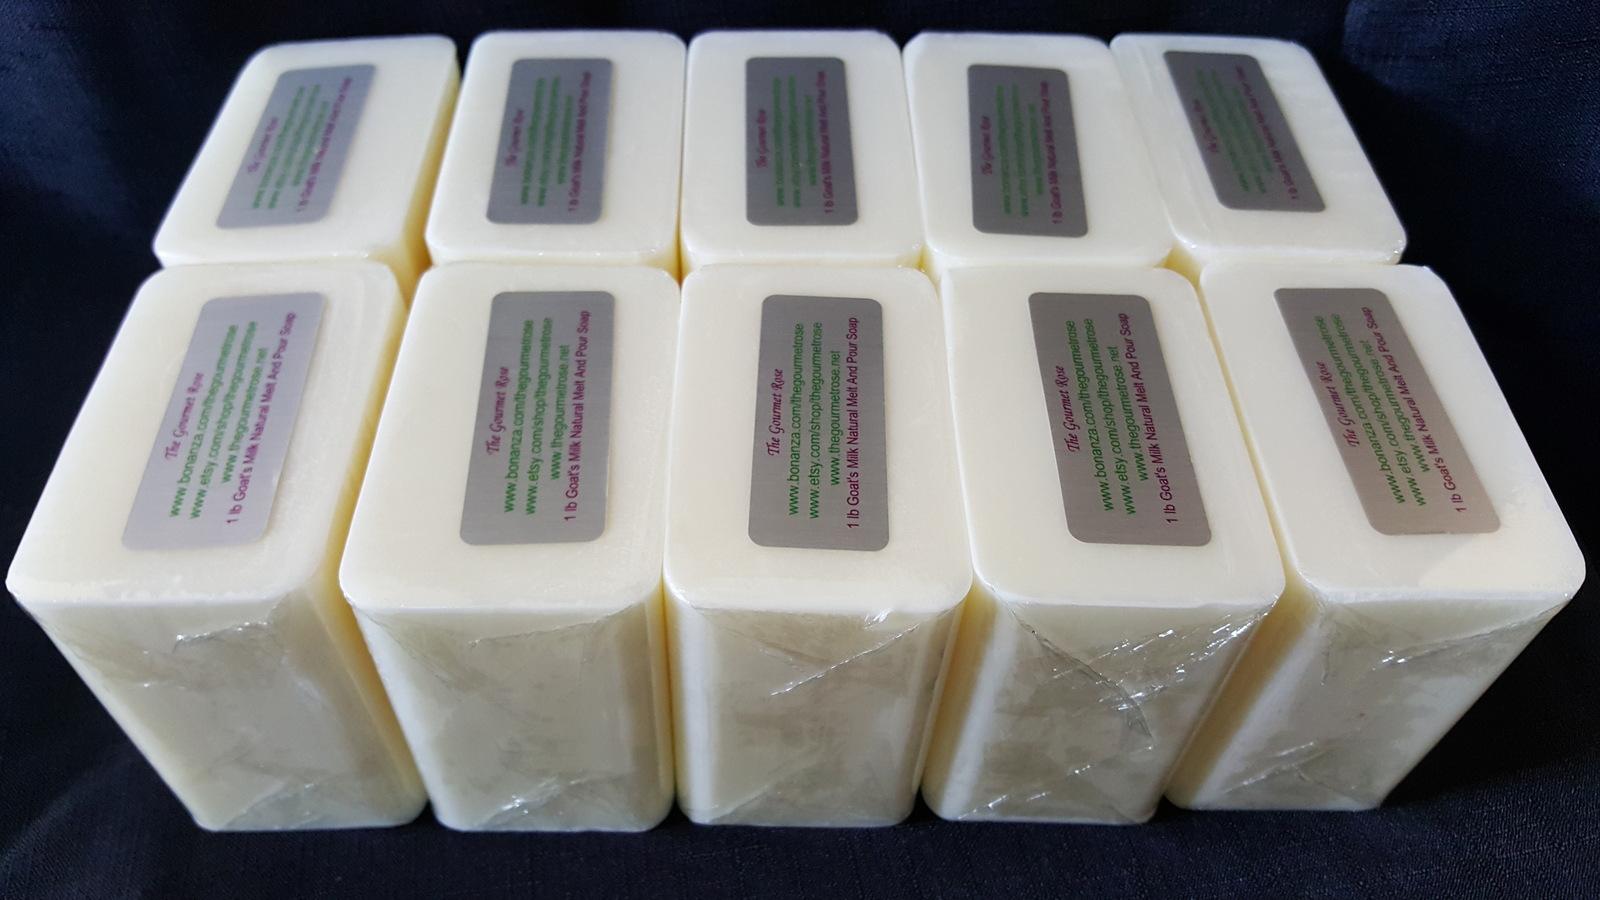 10 lb GOAT'S MILK MELT AND POUR 100% All Natural Soap Base Goat BULK WHOLESALE The Gourmet Rose